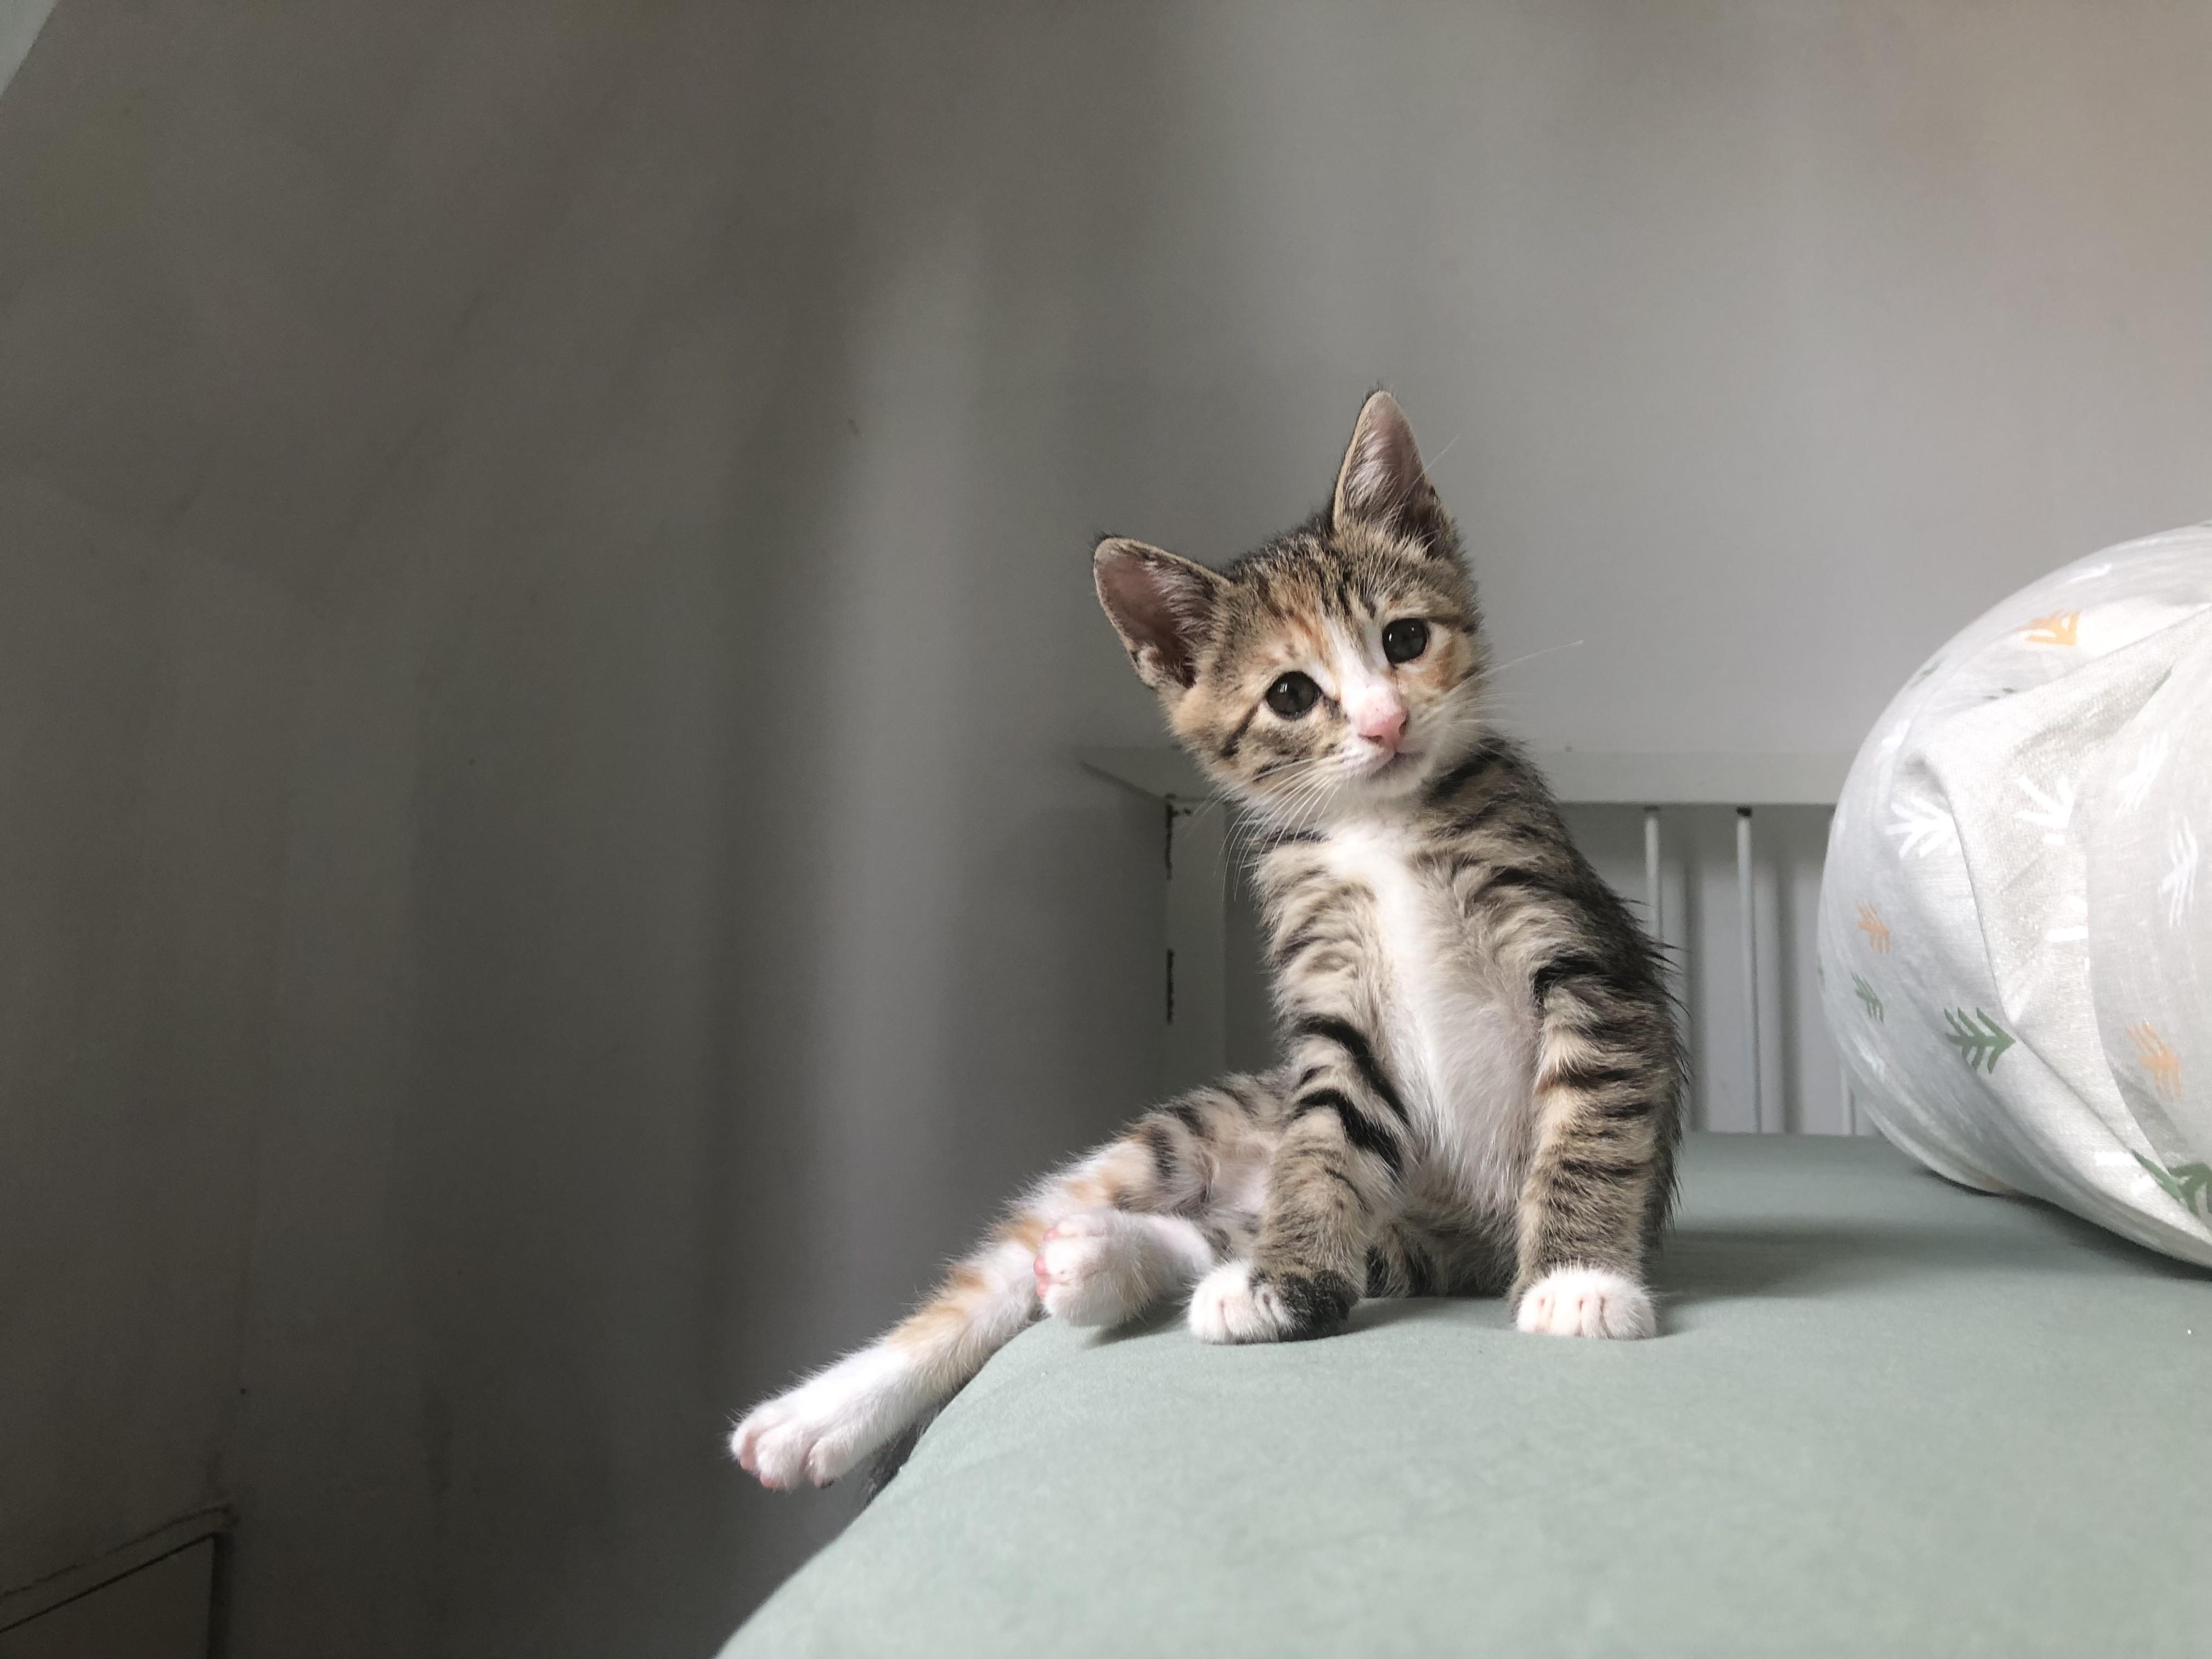 Gambar Anak Kucing Imut Binatang Menyusui Bertulang